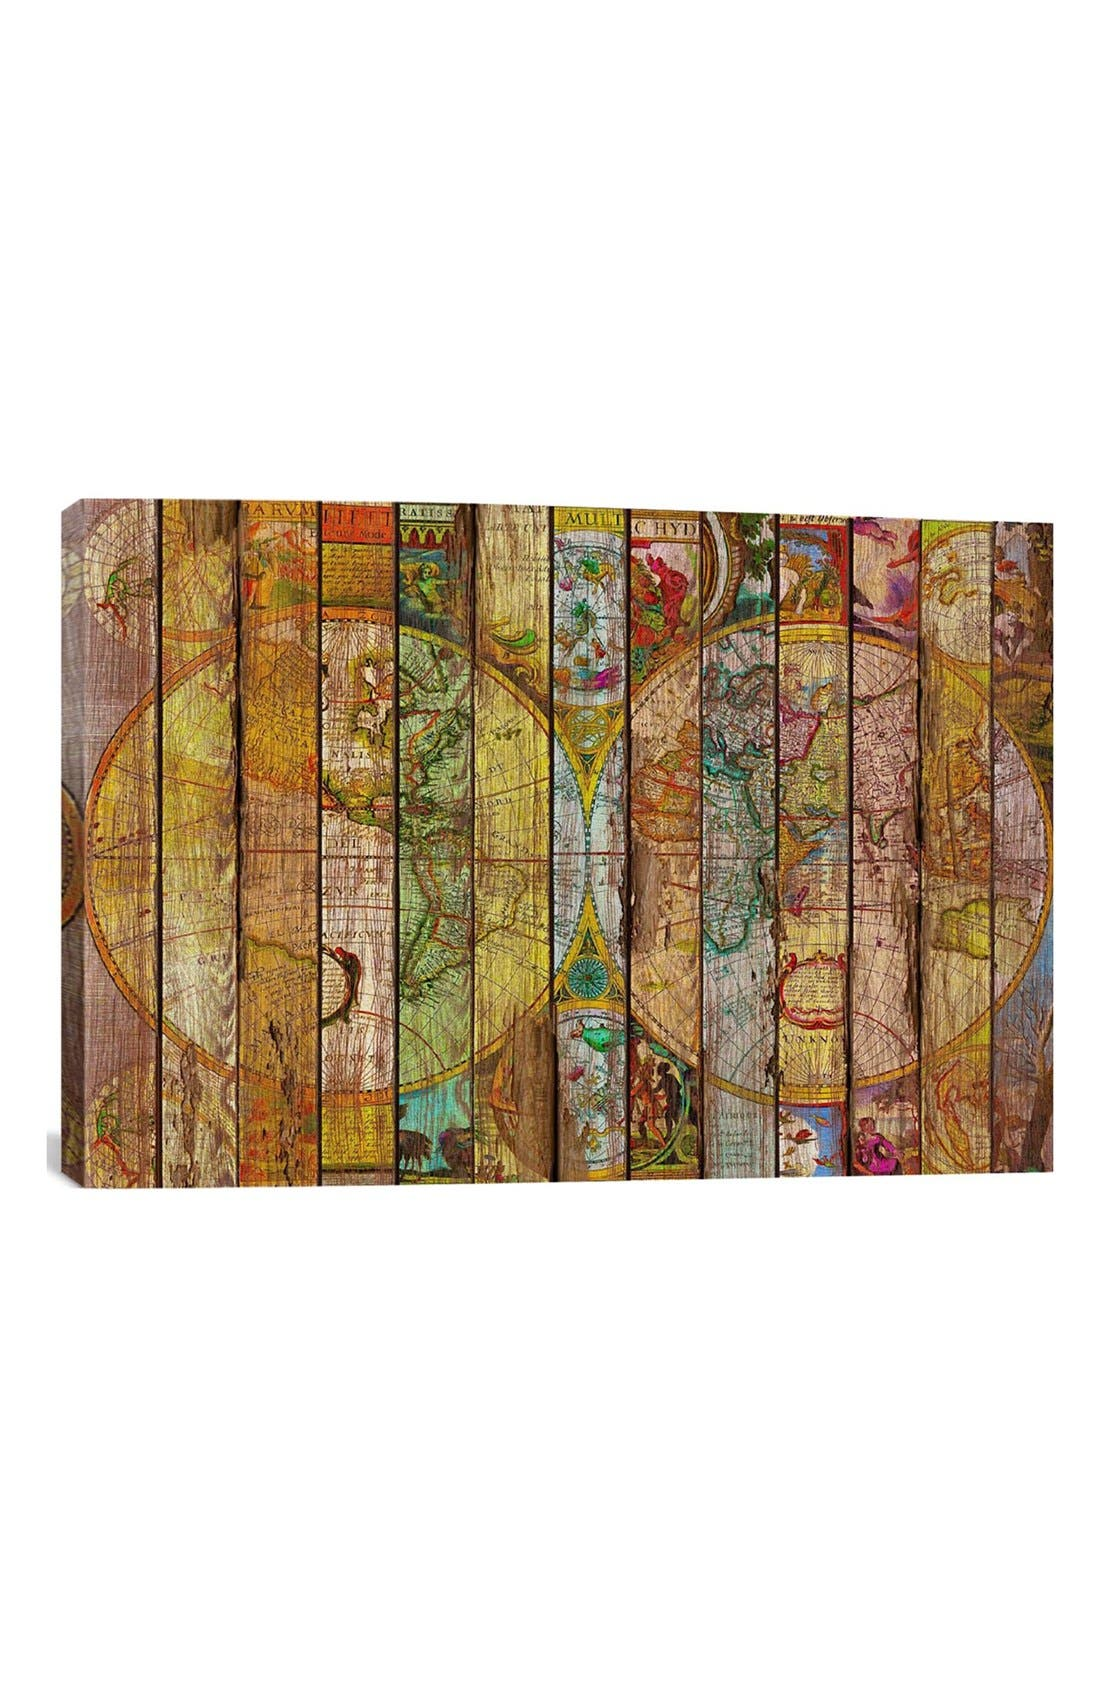 iCanvas 'Around the World in 13 Maps - Maximilian San' Giclée Print Canvas Art